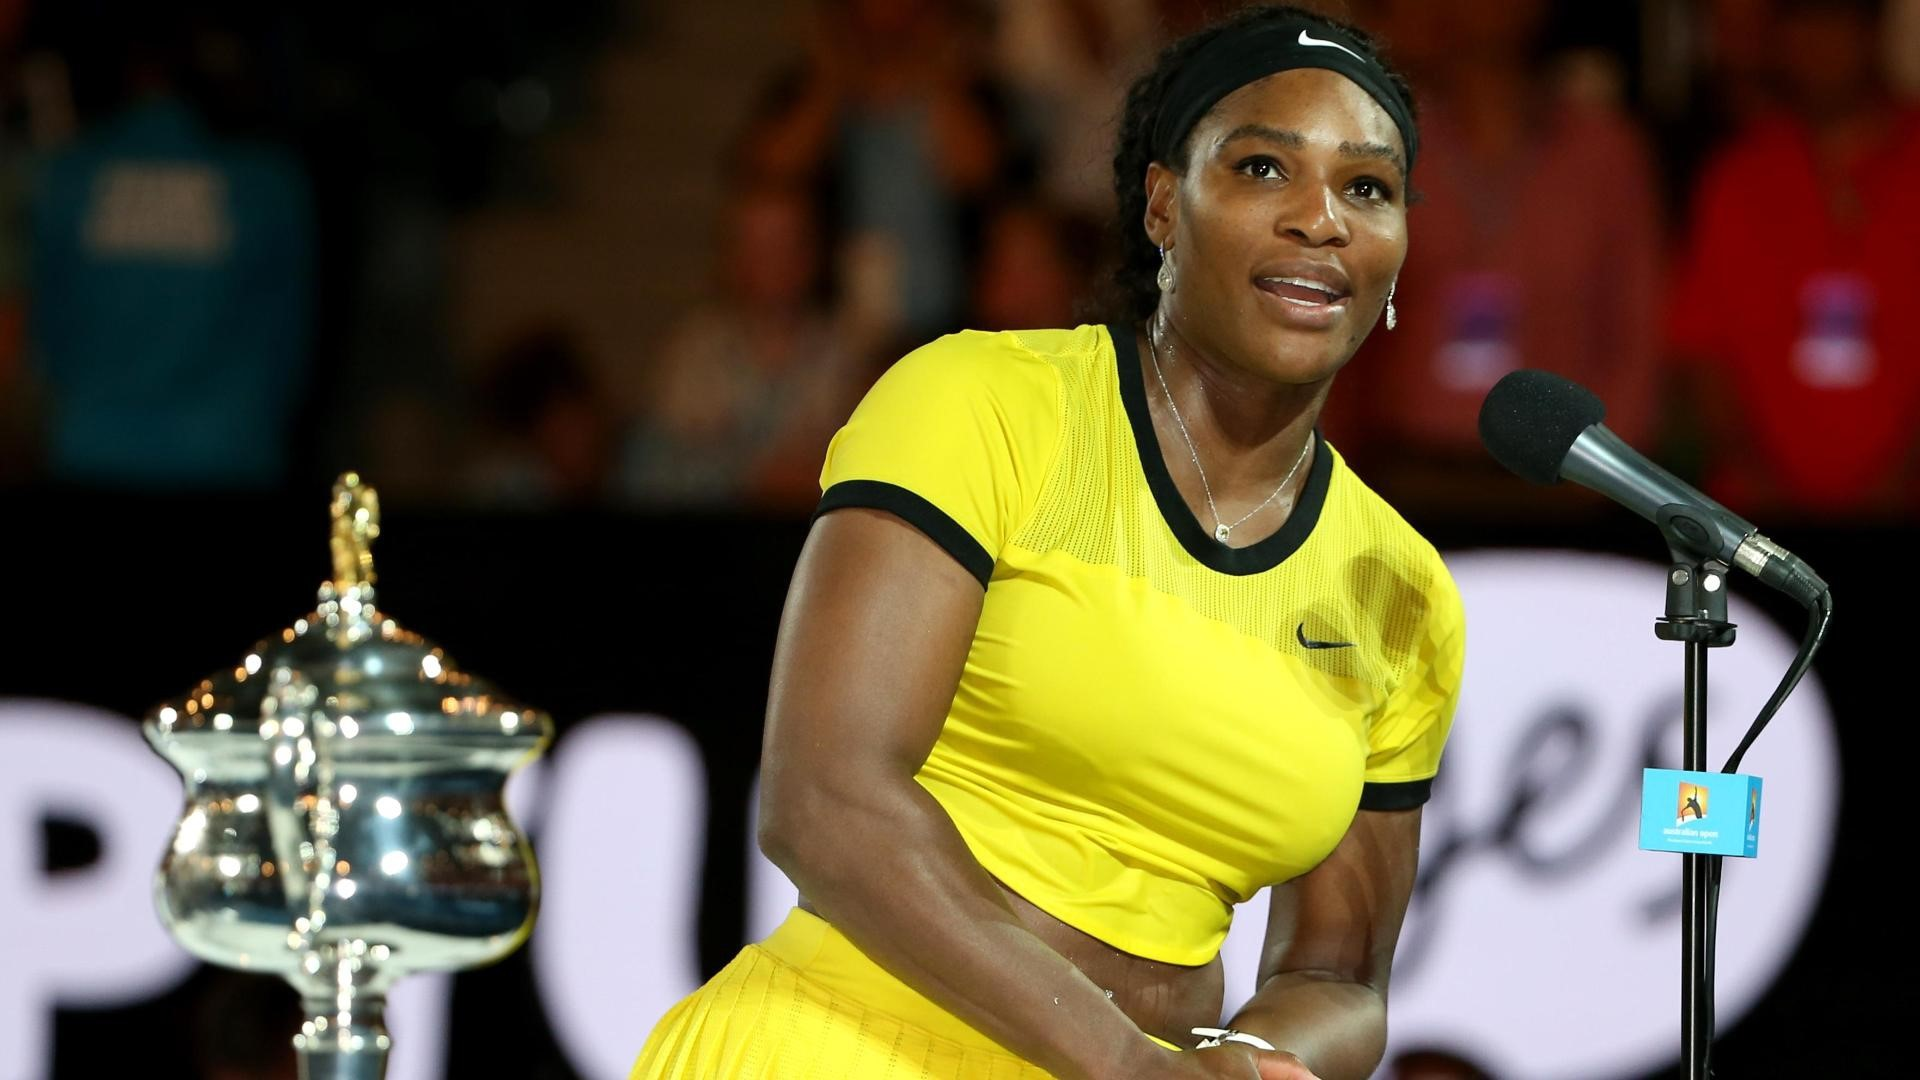 Serena Williams Background images